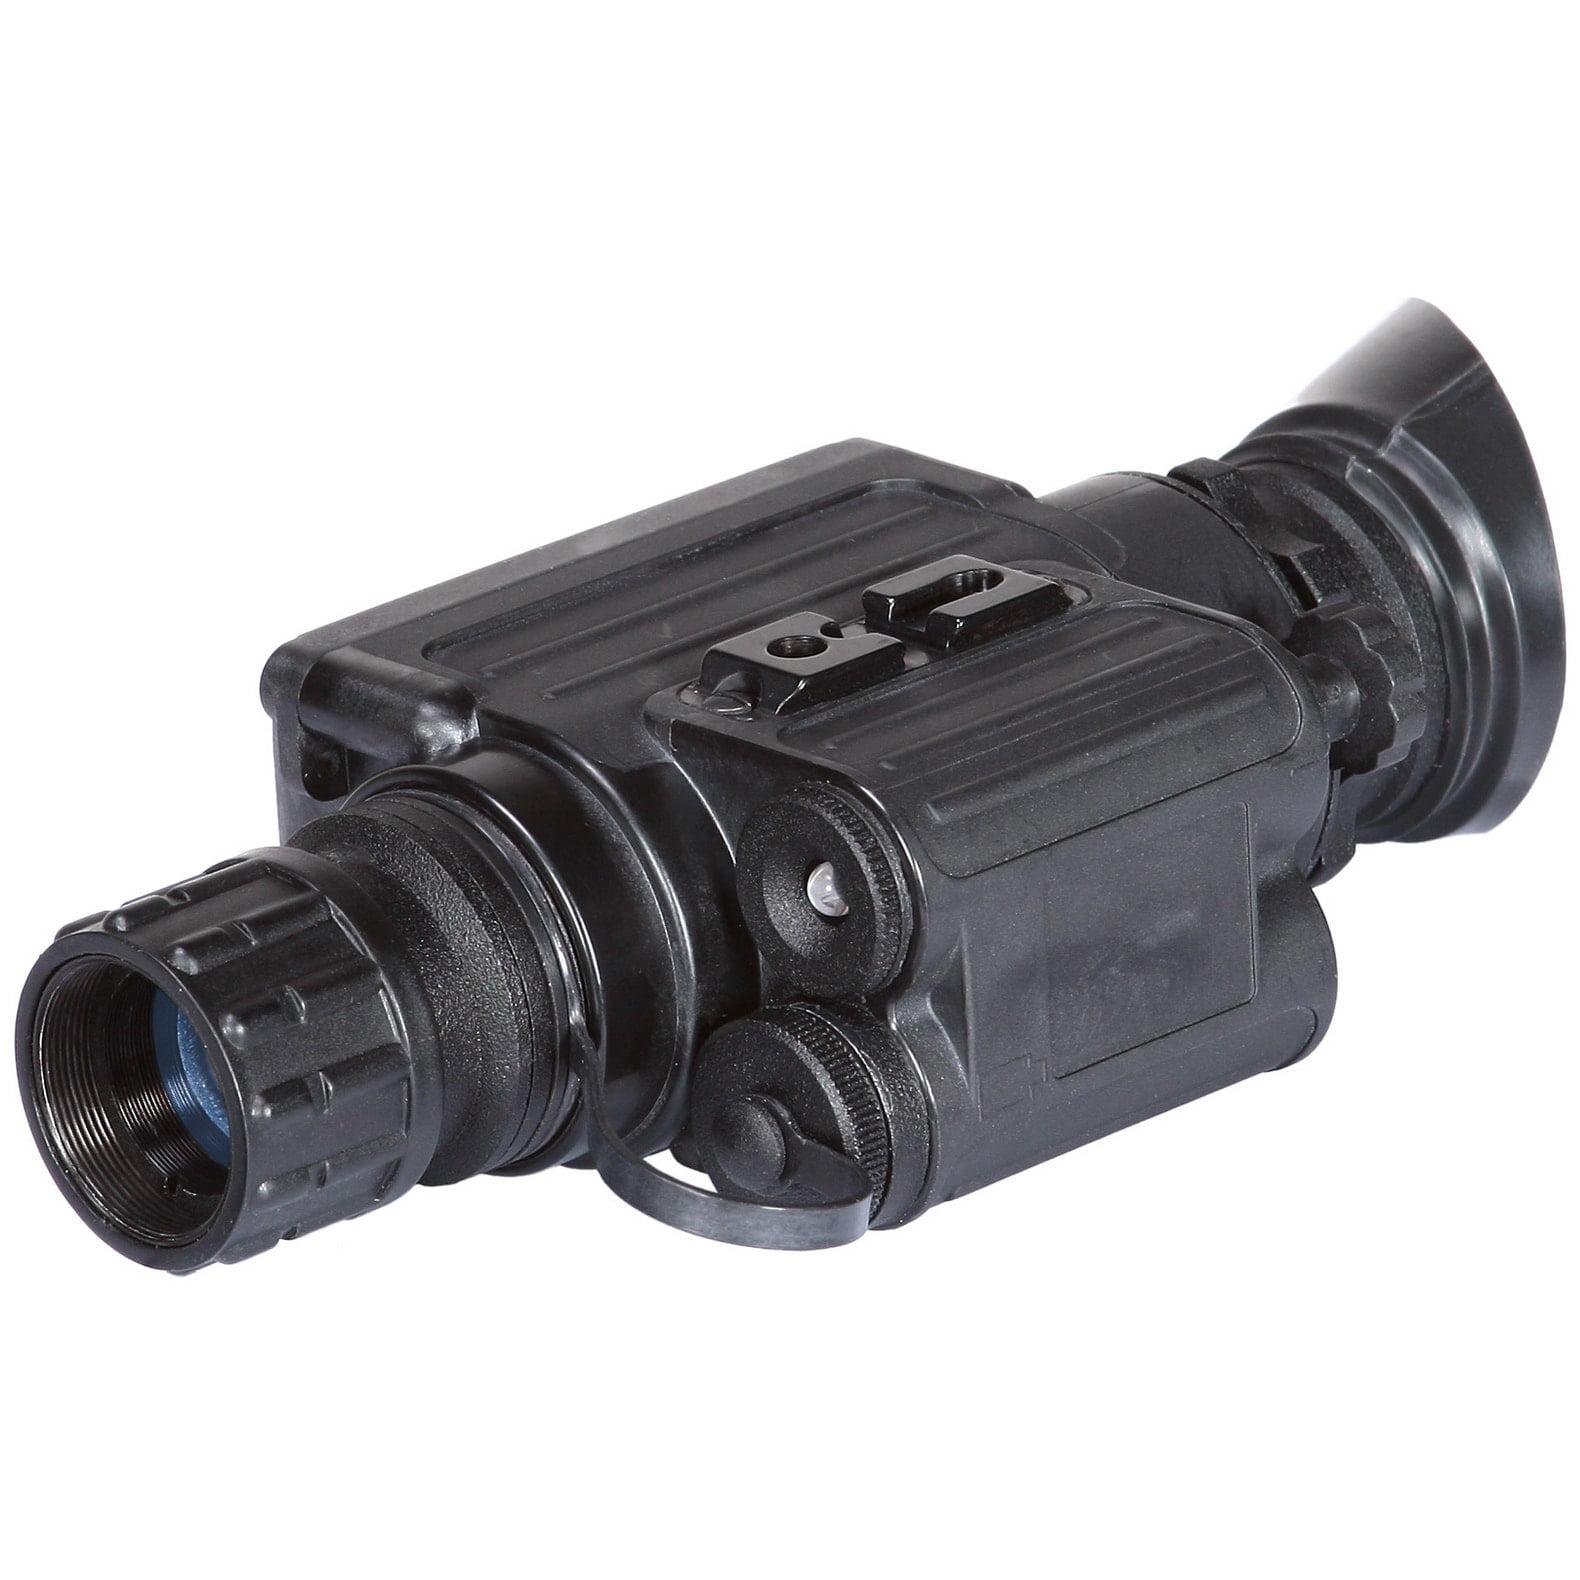 Armasight Spark CORE, Night Vision Monocular, 1X35, Generation Core, 60-70 lp mm, Multipurpose, IR Illuminator, Black F by Armasight